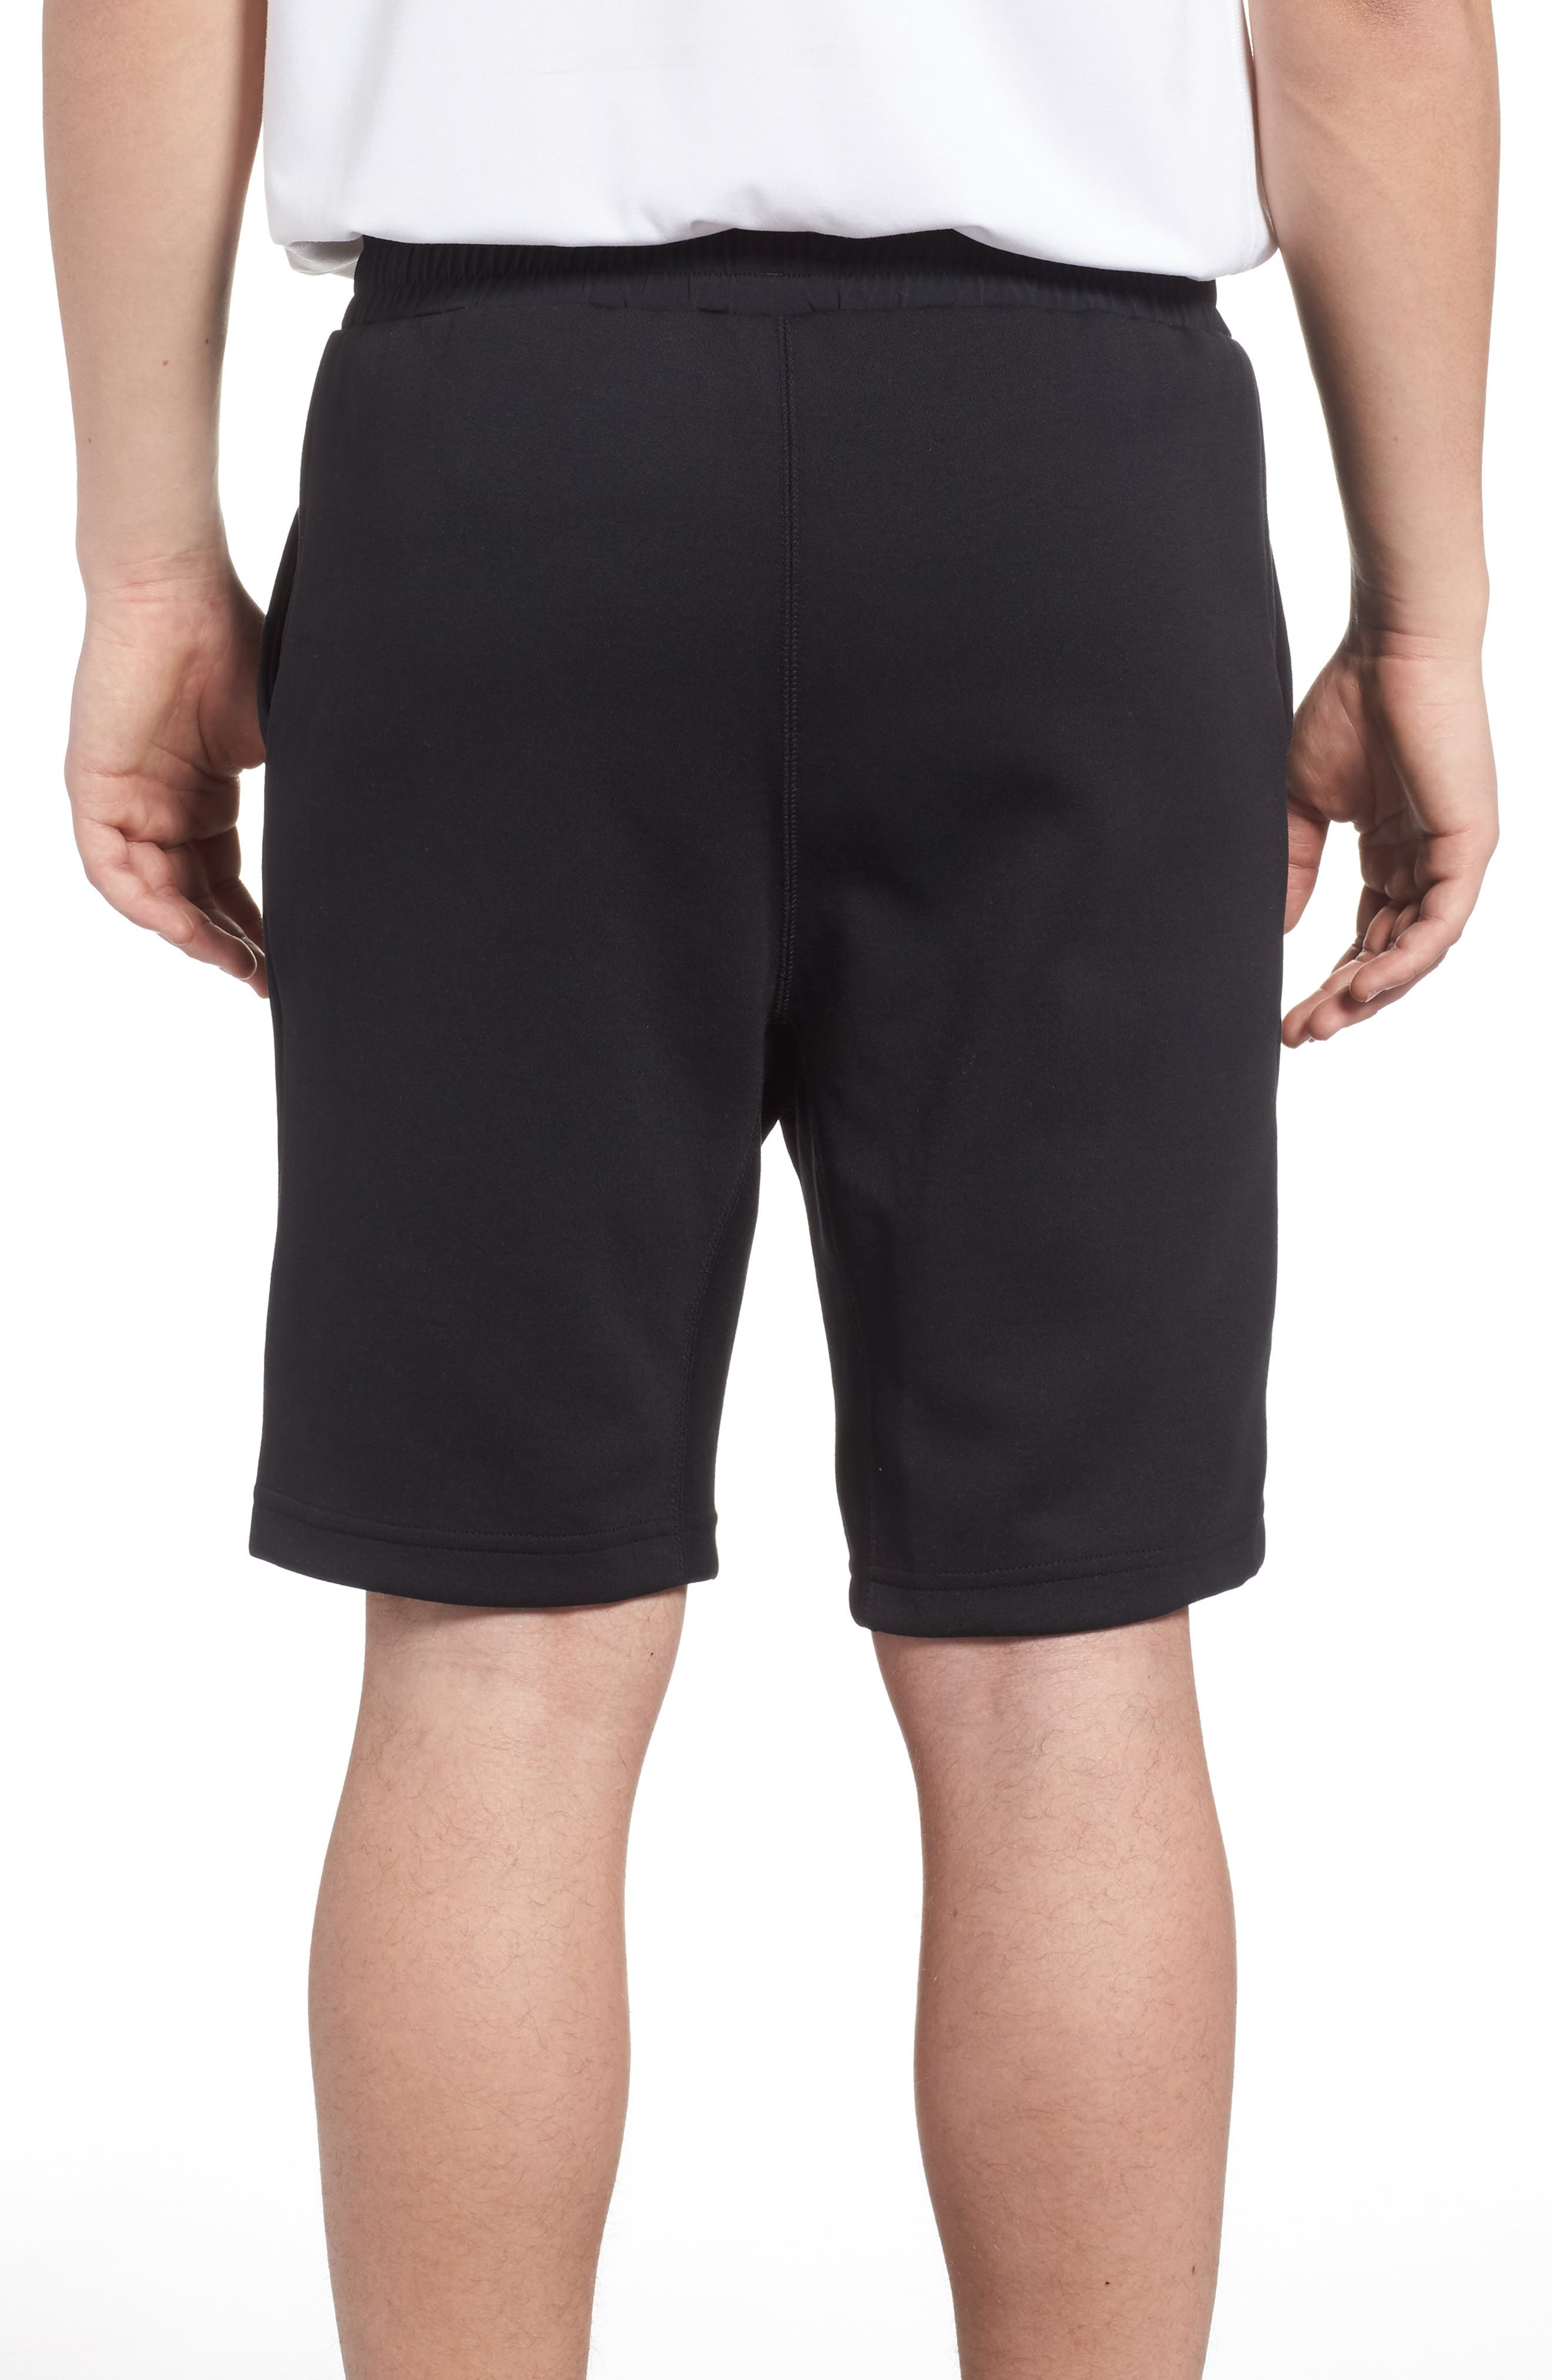 TS Knit Shorts,                             Alternate thumbnail 2, color,                             005